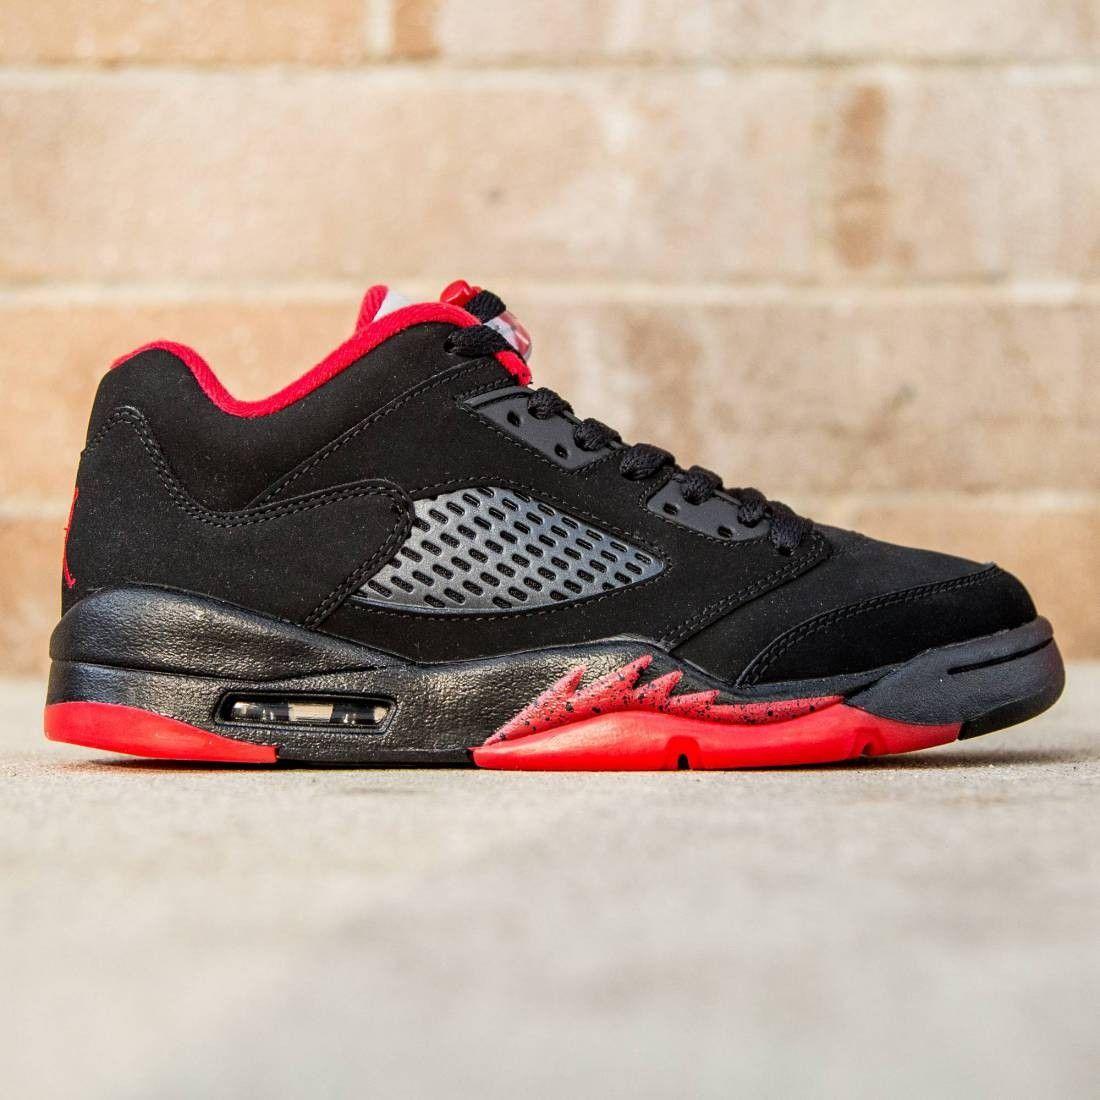 new arrival dfffd 6568d Air Jordan 5 Retro Low GS Big Kids (black   gym red   black)